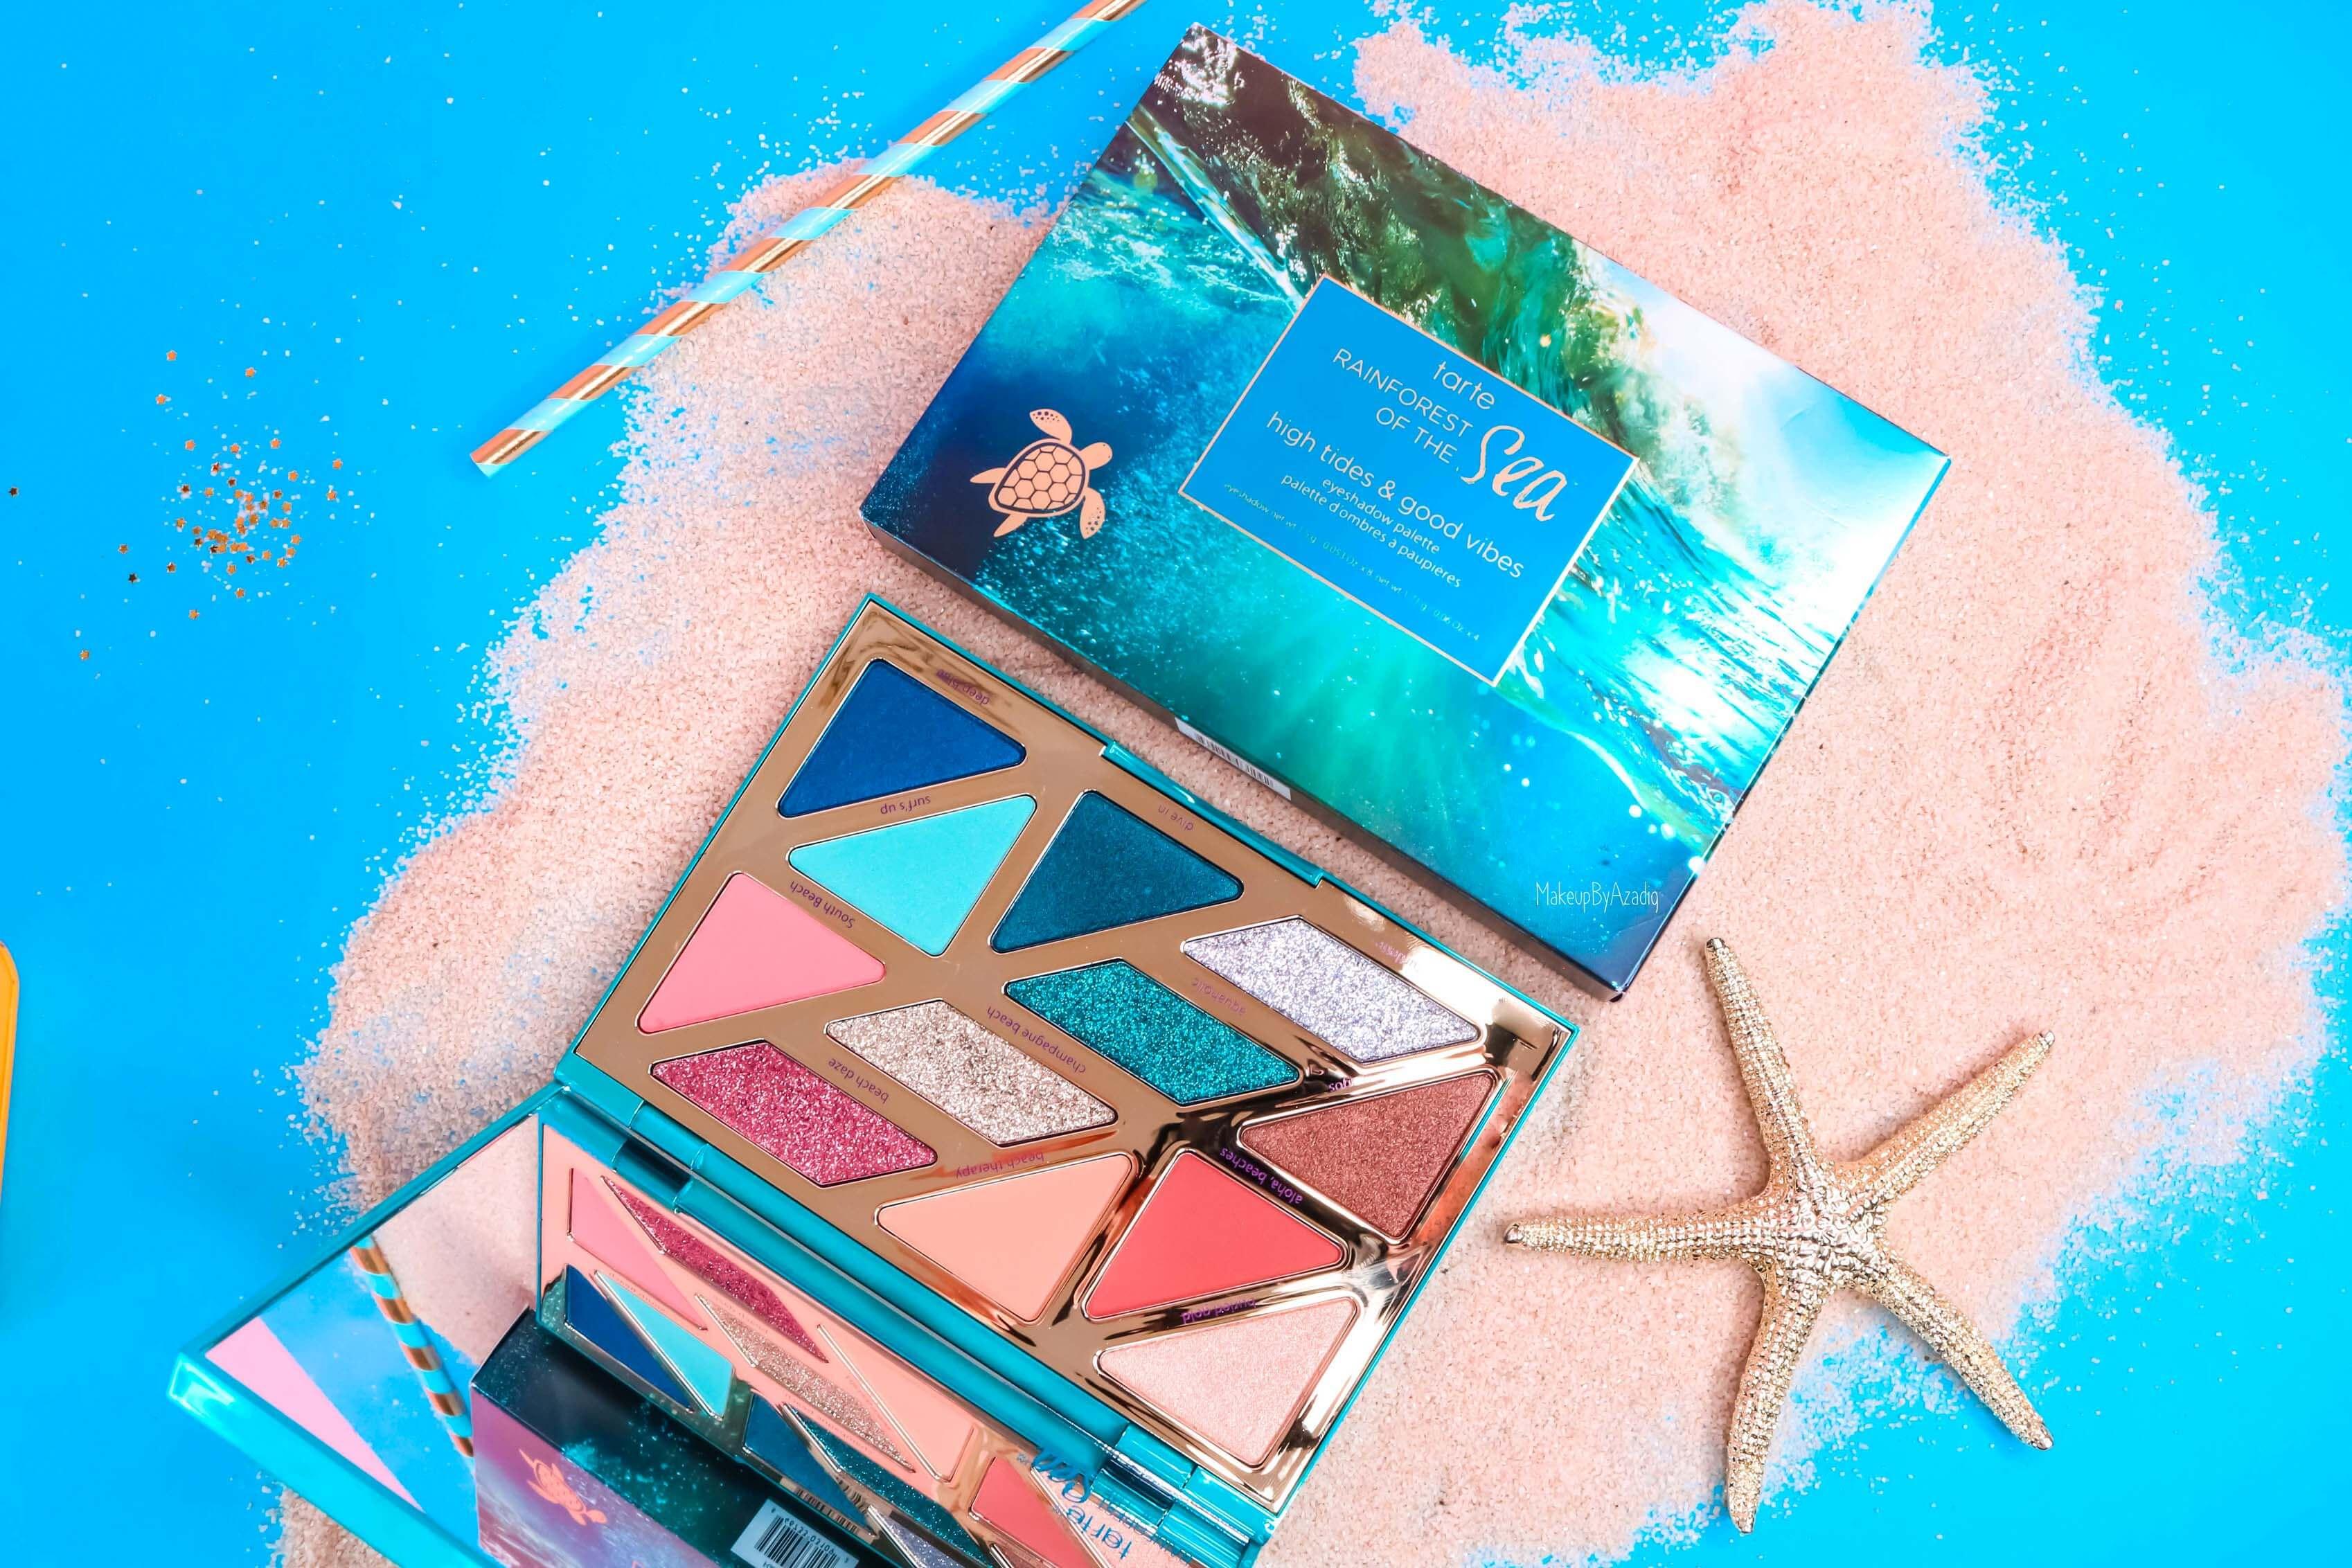 revue-palette-tarte-cosmetics-france-sephora-makeupbyazadig-swatch-prix-avis-rainforest-of-the-sea-good-vibes